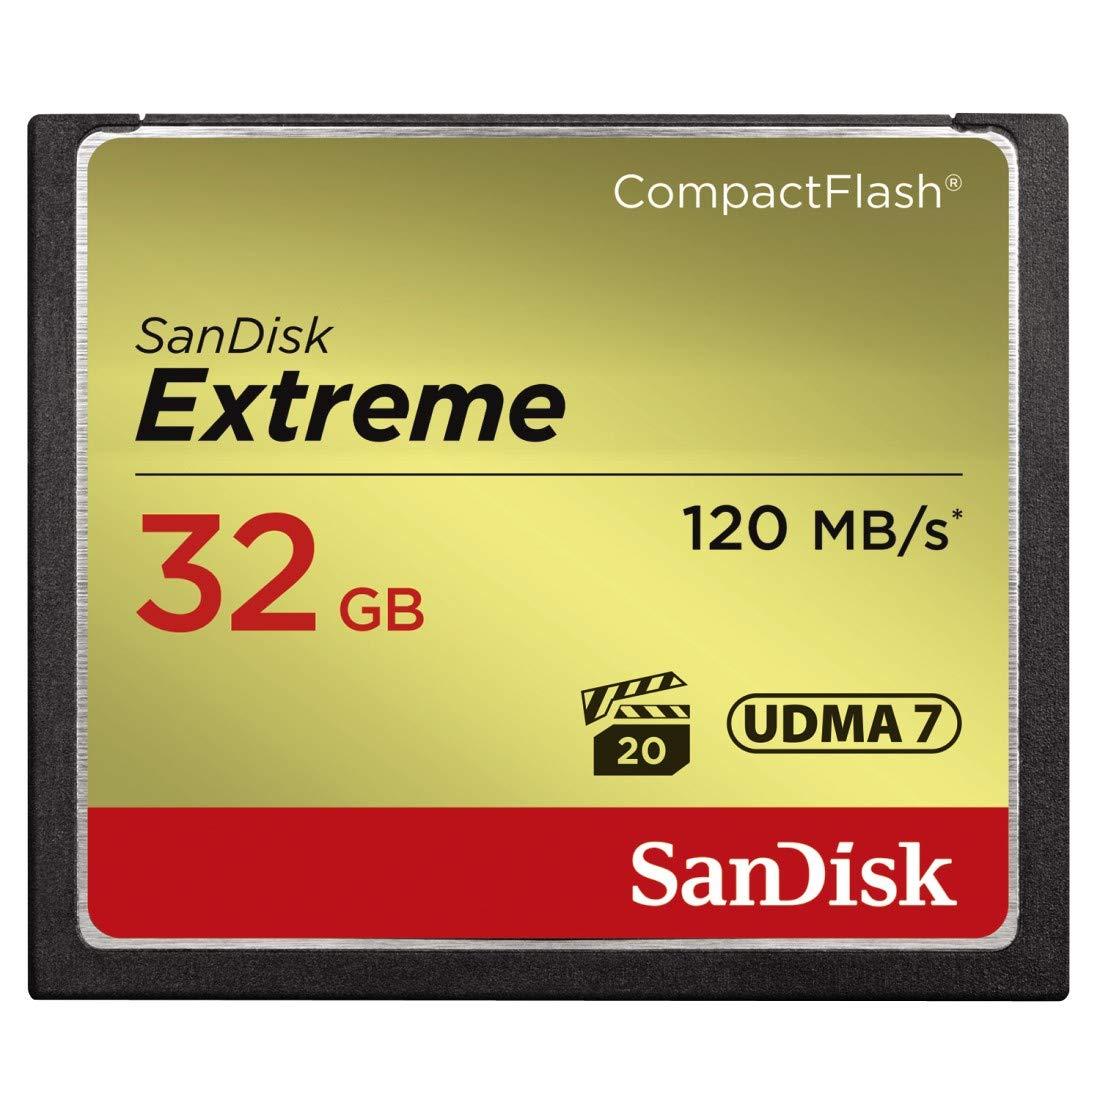 SanDisk Extreme 32GB CompactFlash Memory Card UDMA 7 Speed